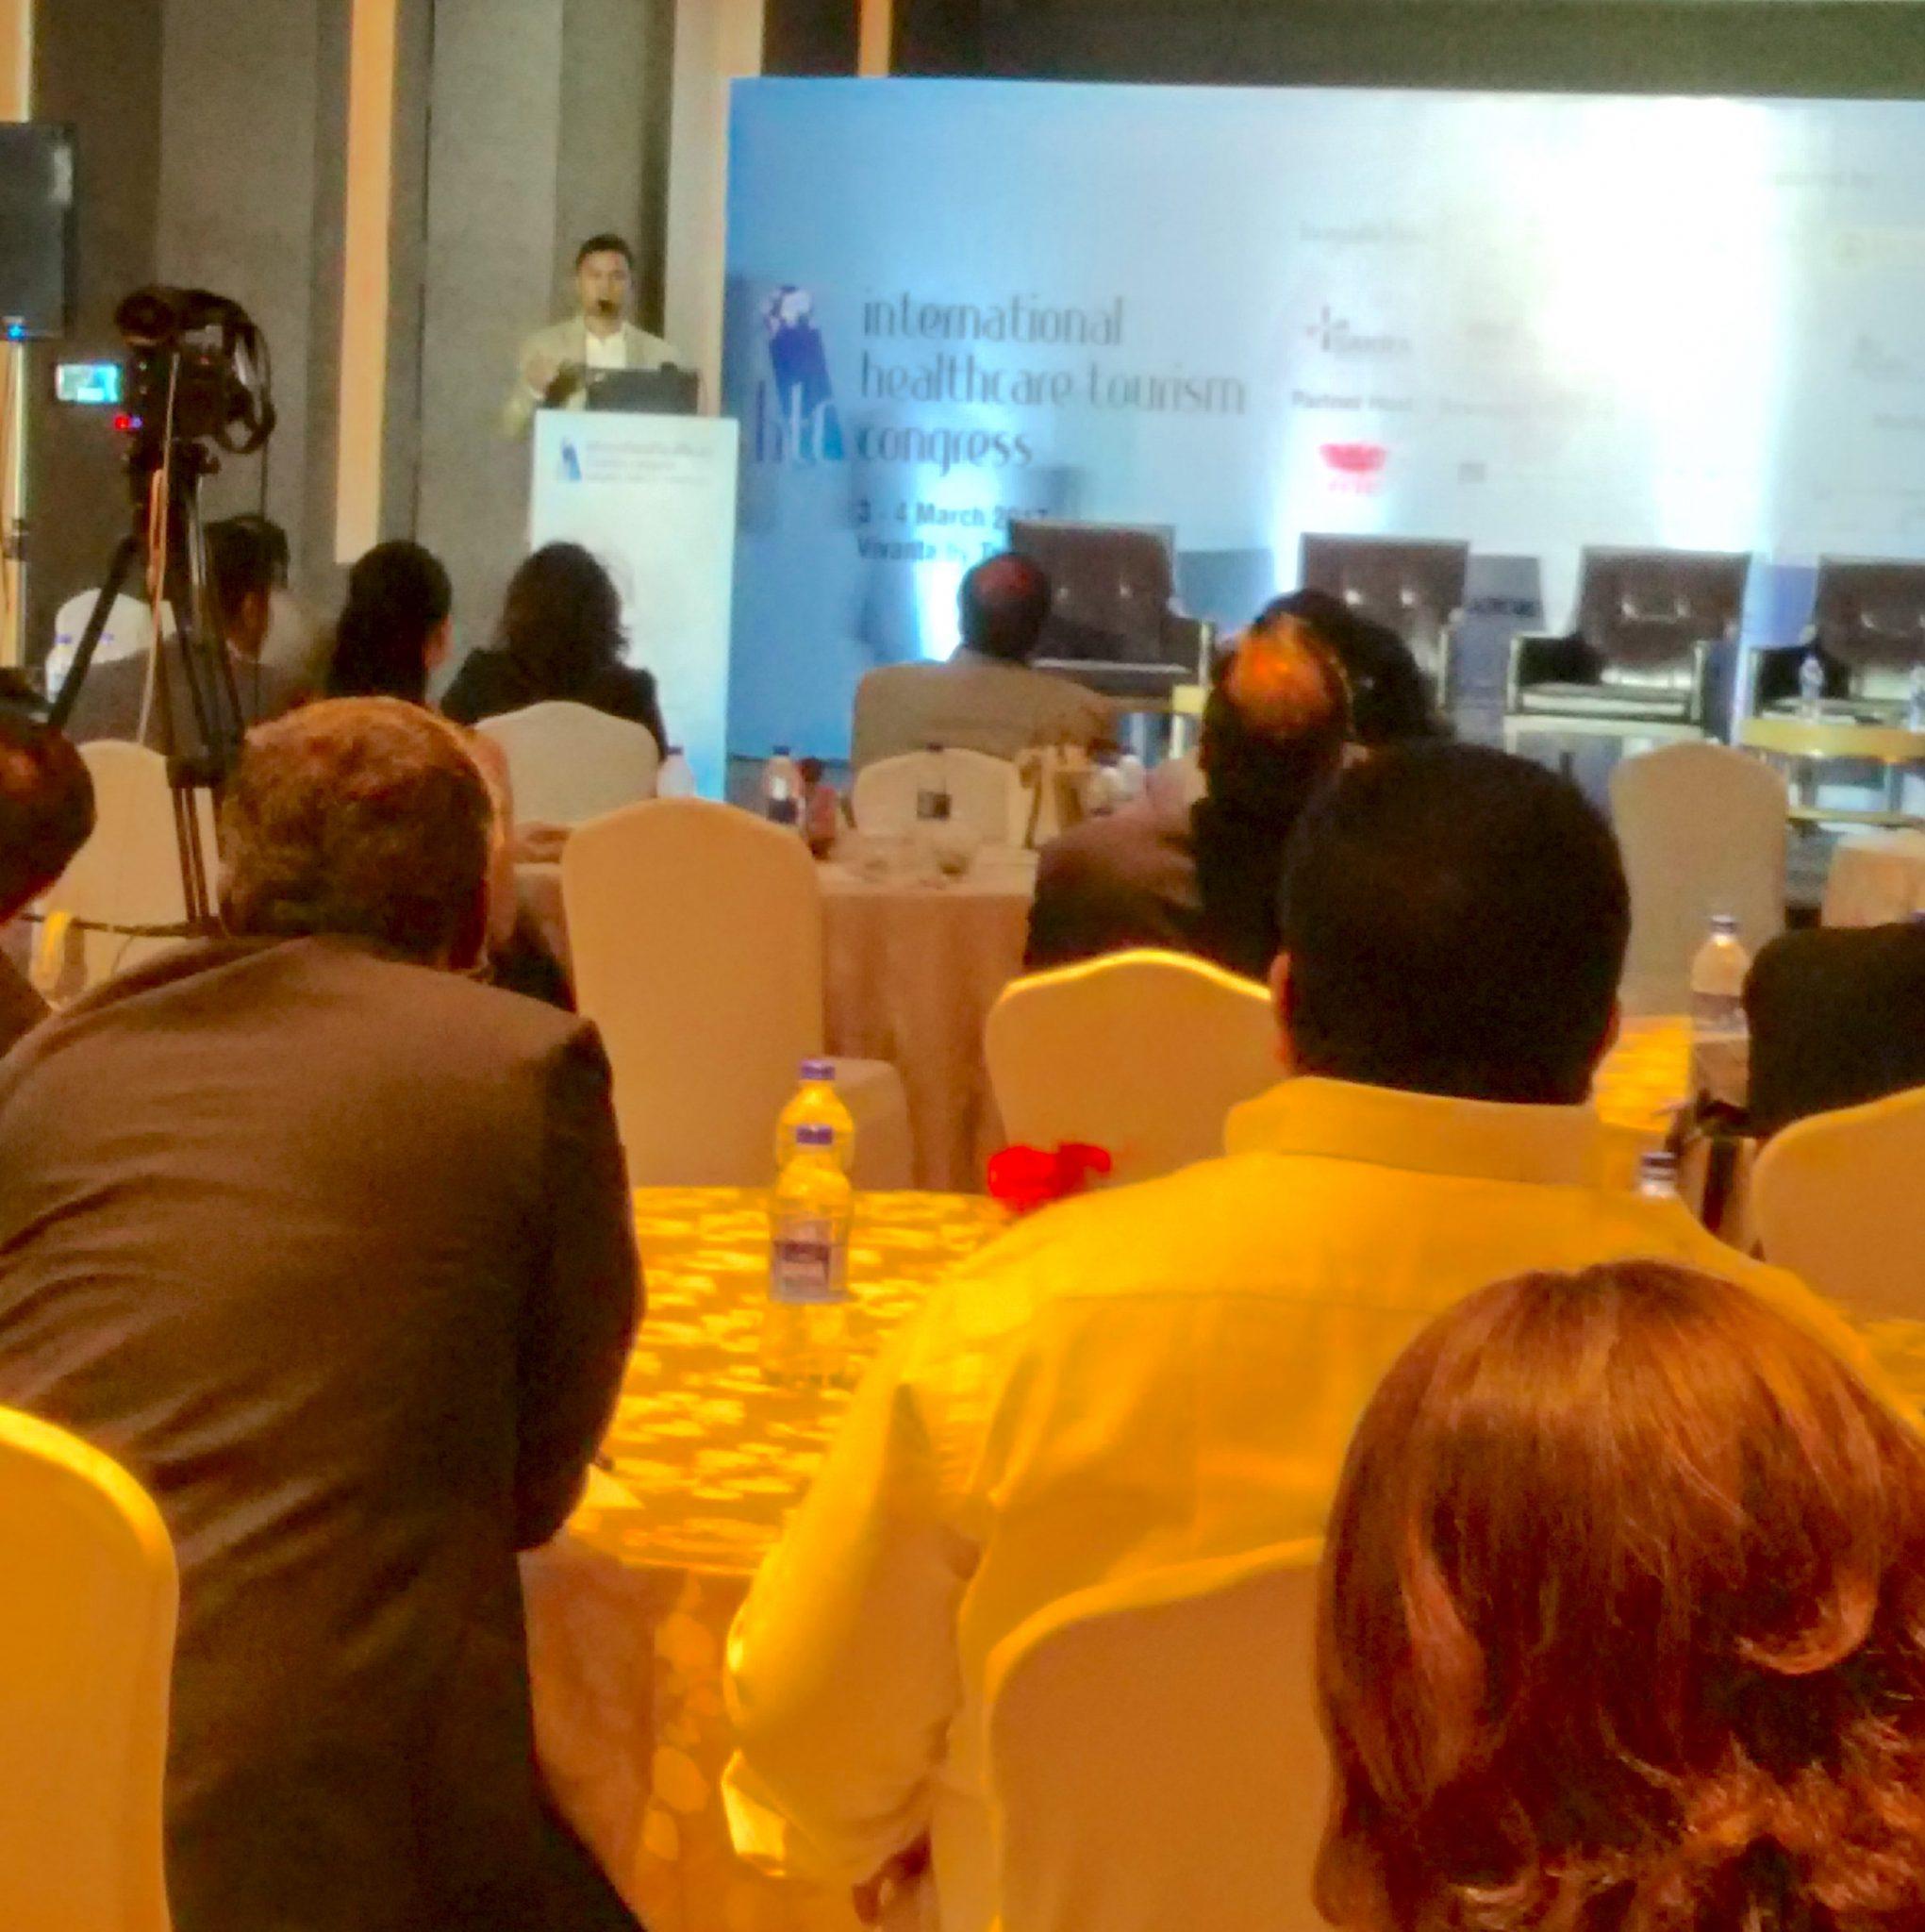 Amarantos at International Health Congress